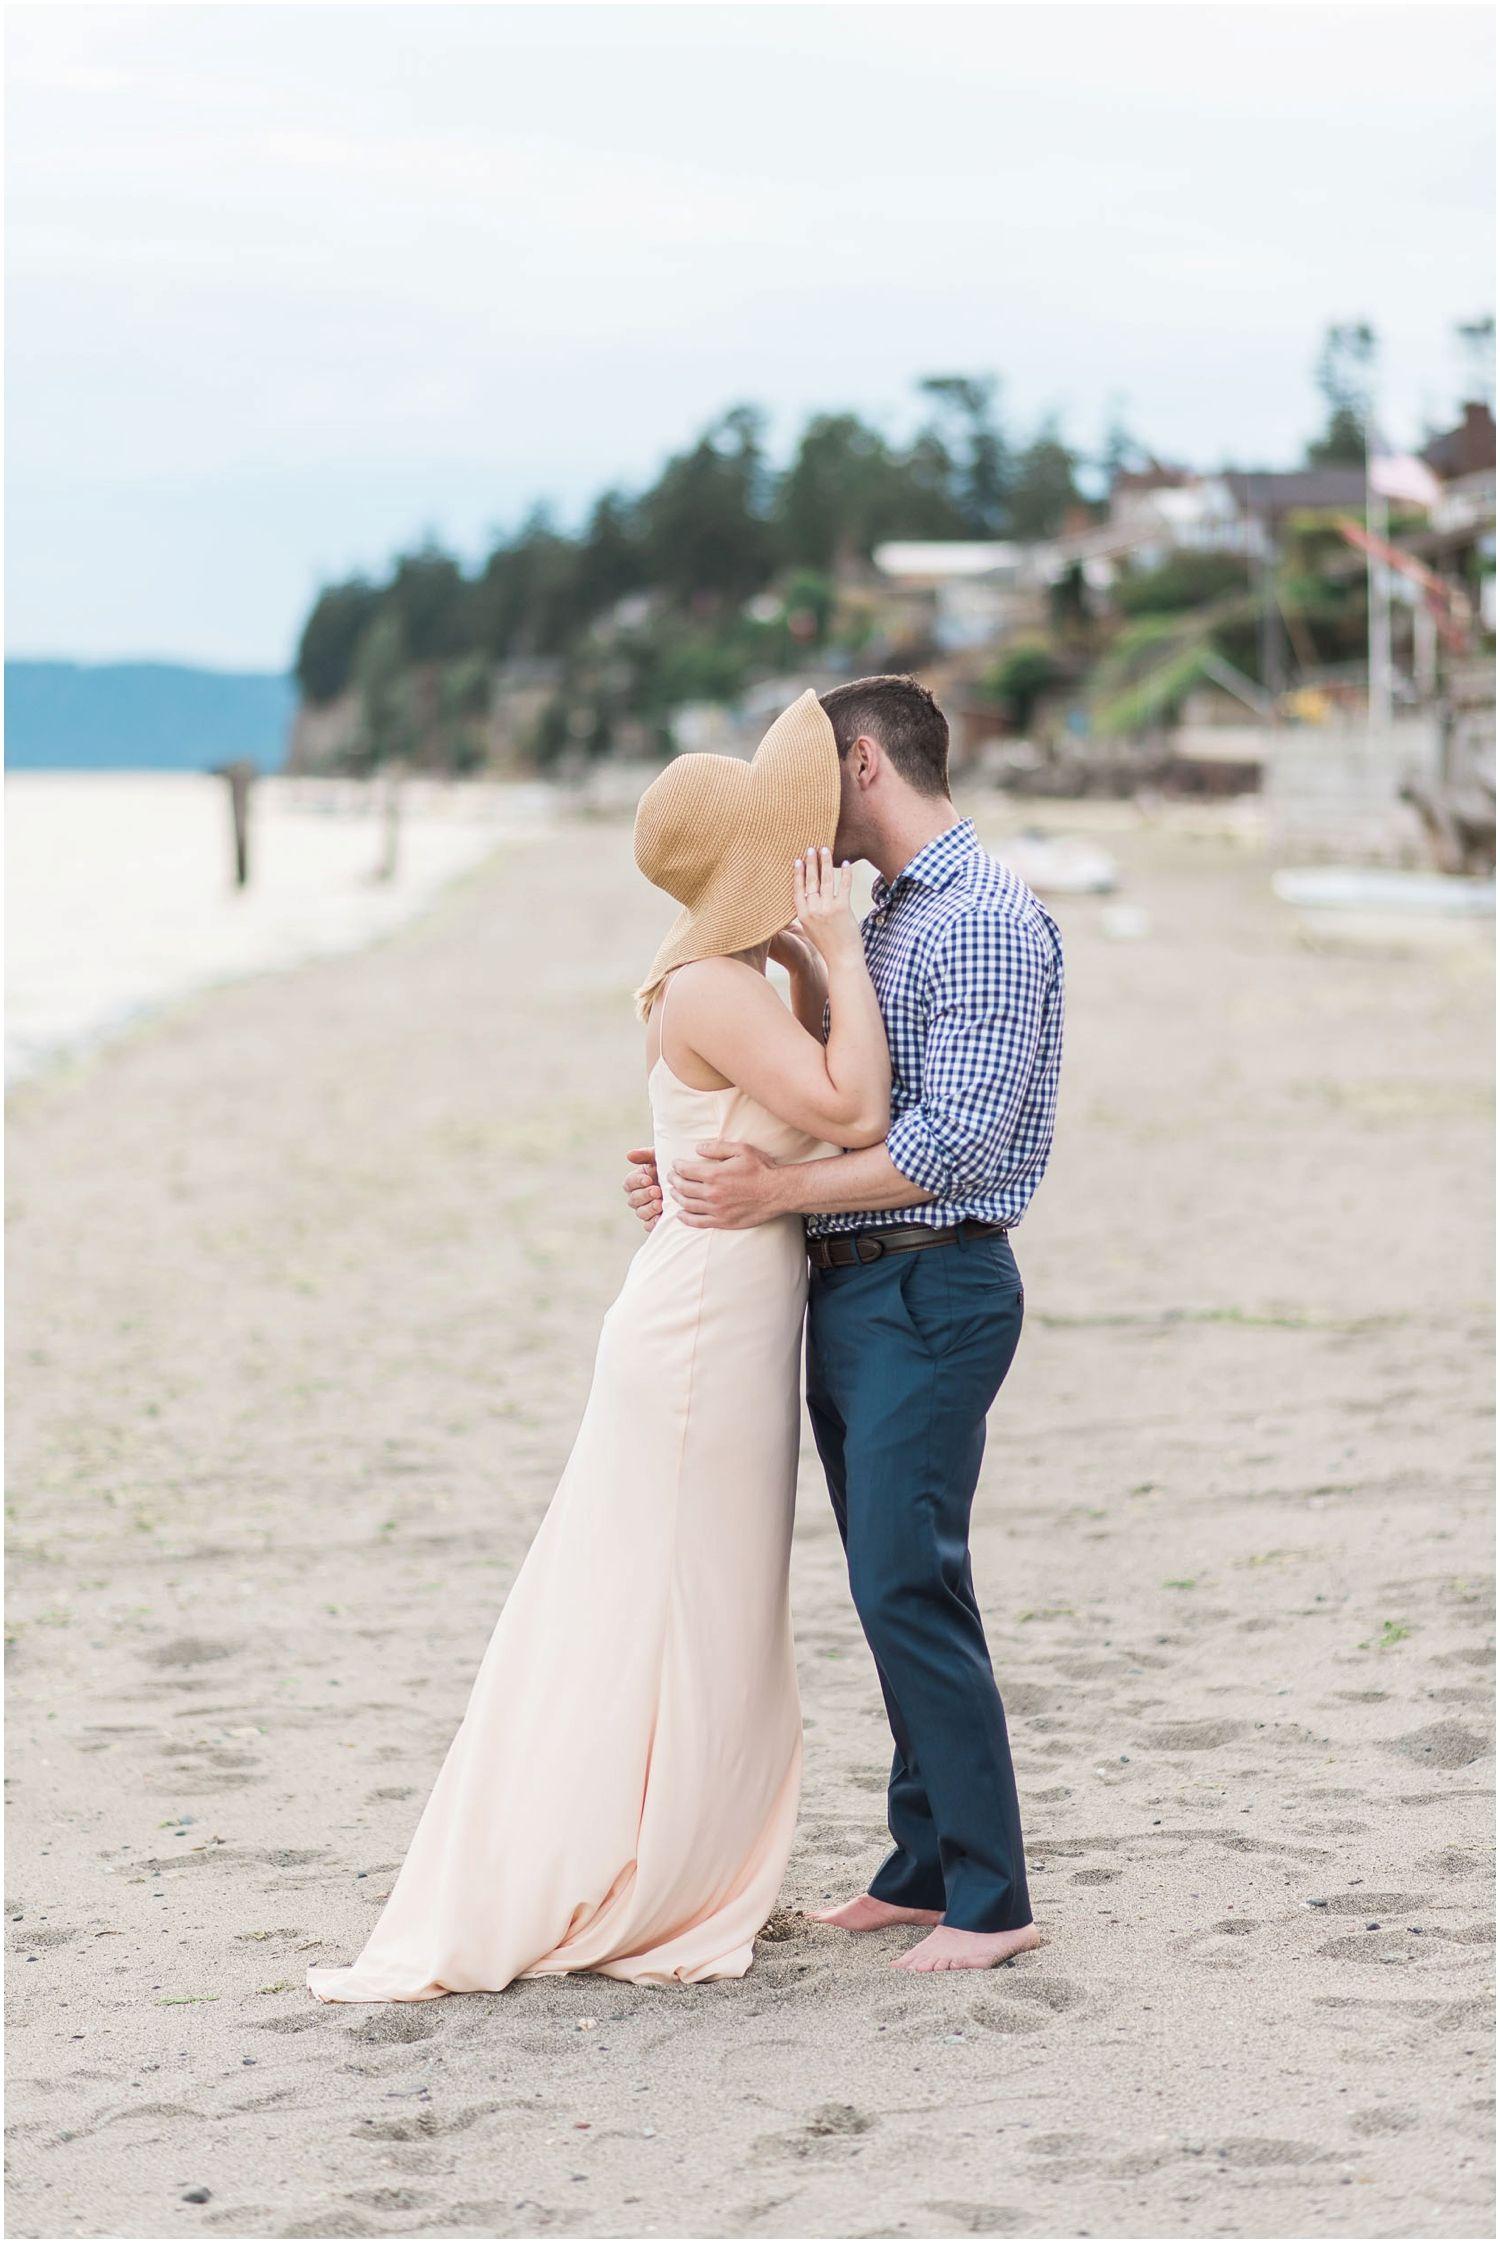 Nautical beach engagement mission beach pnw beach wedding